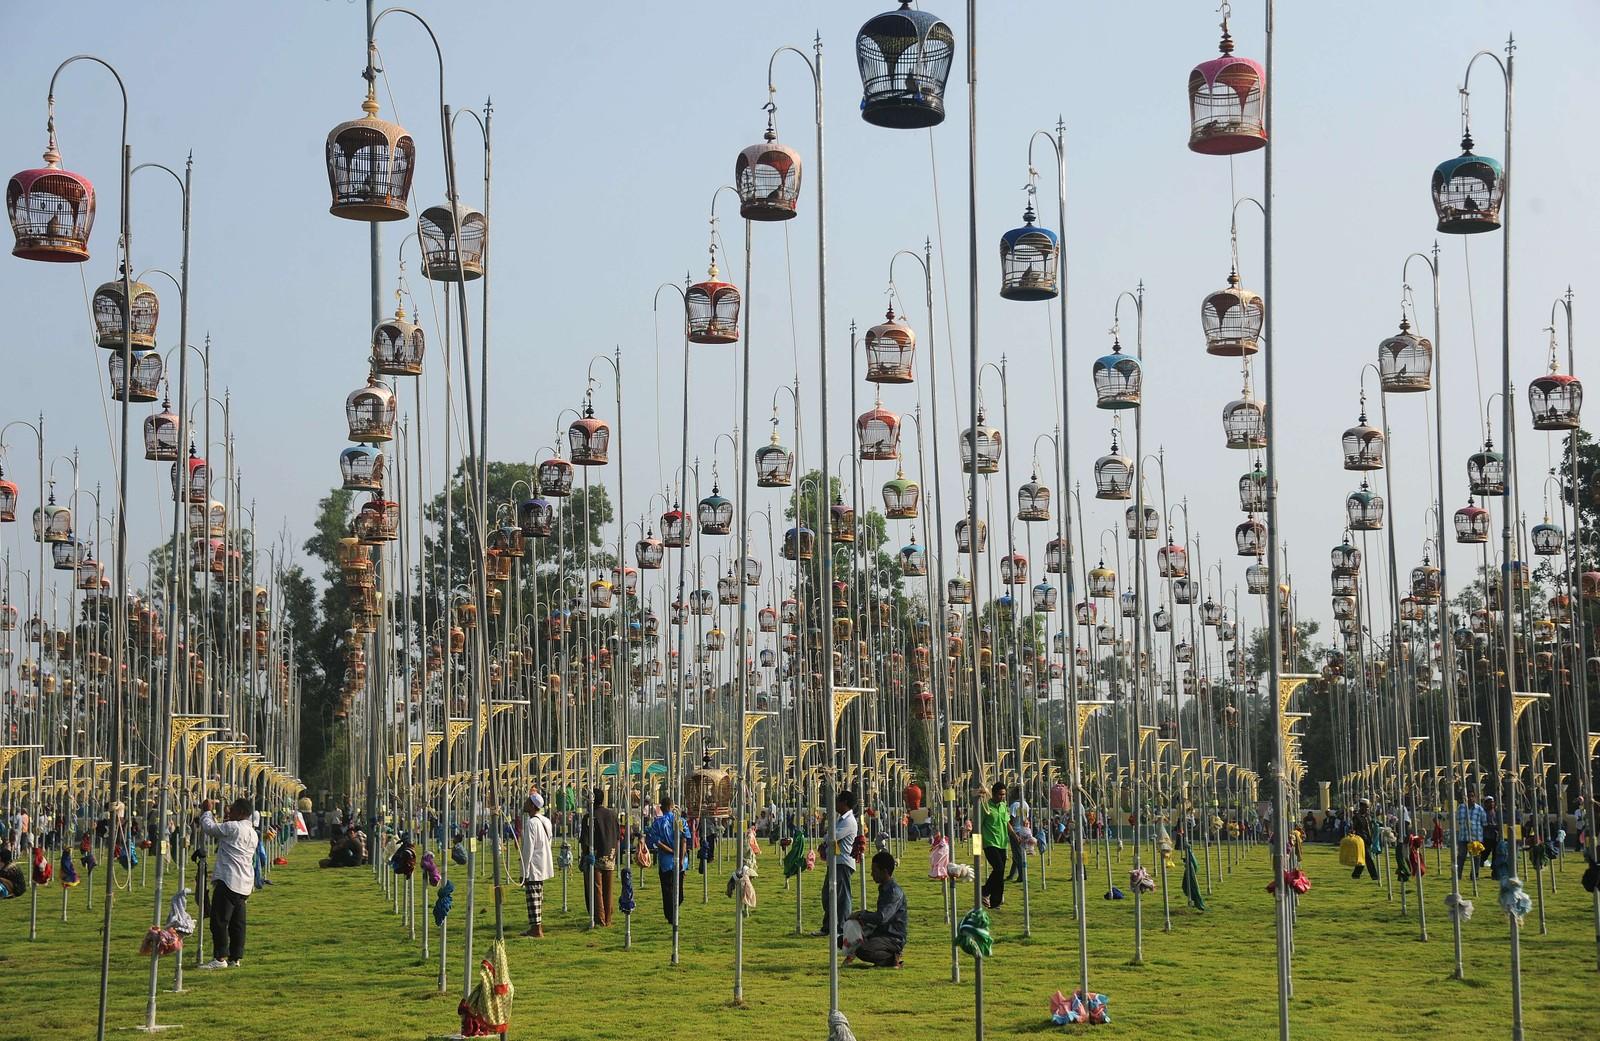 Fugler i bur deltar i en fuglesang-konkurranse i Thailand. Over 1000 fugler fra Thailand, Malaysia og Singapore deltar.